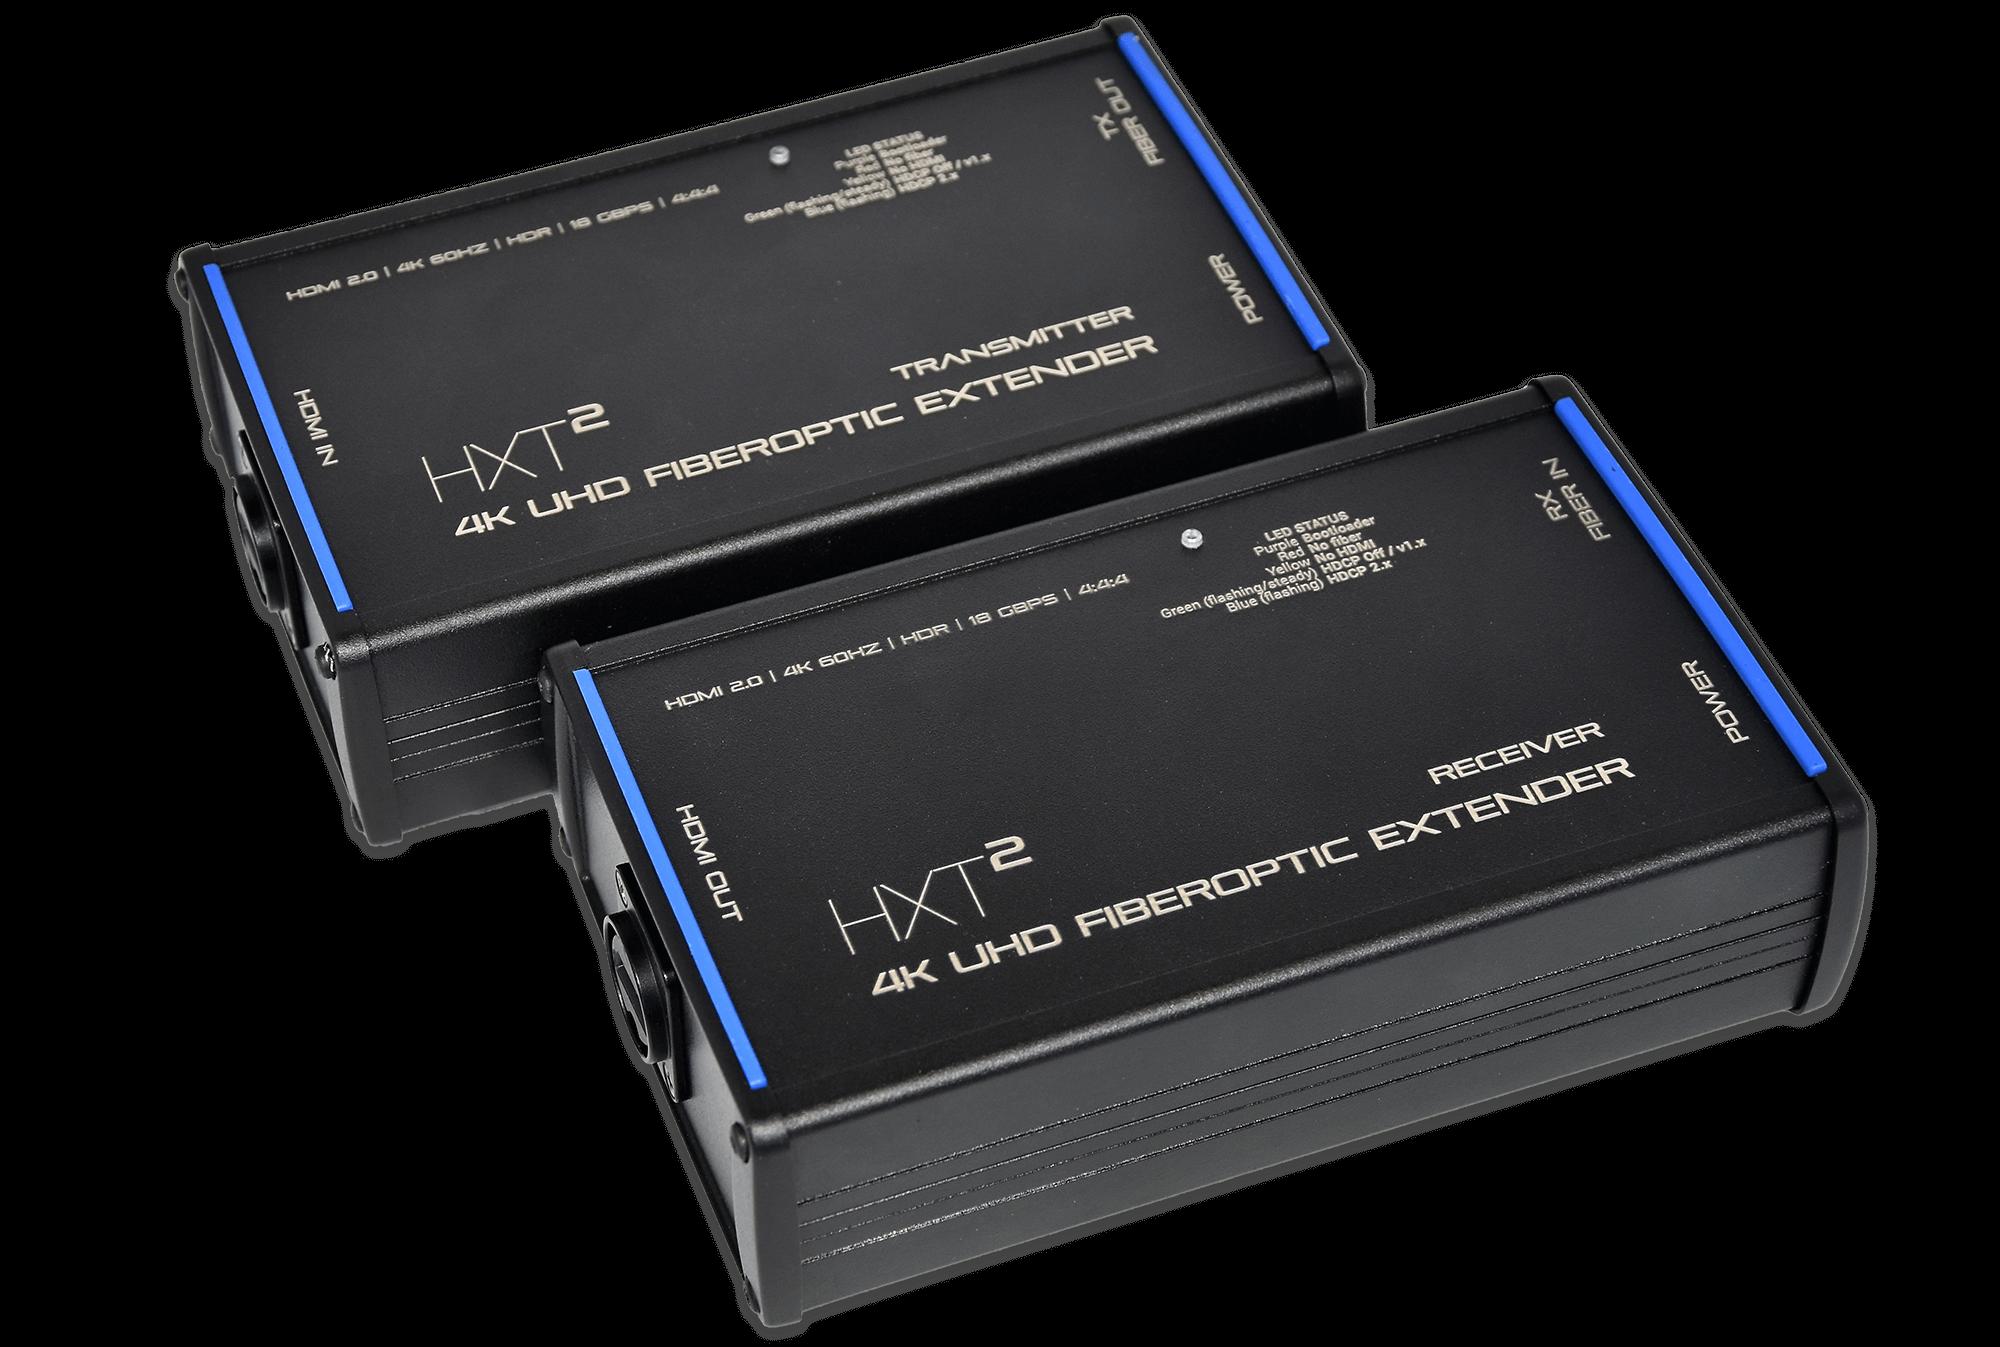 HXT²: 4k uhd hdmi fiber optic extender